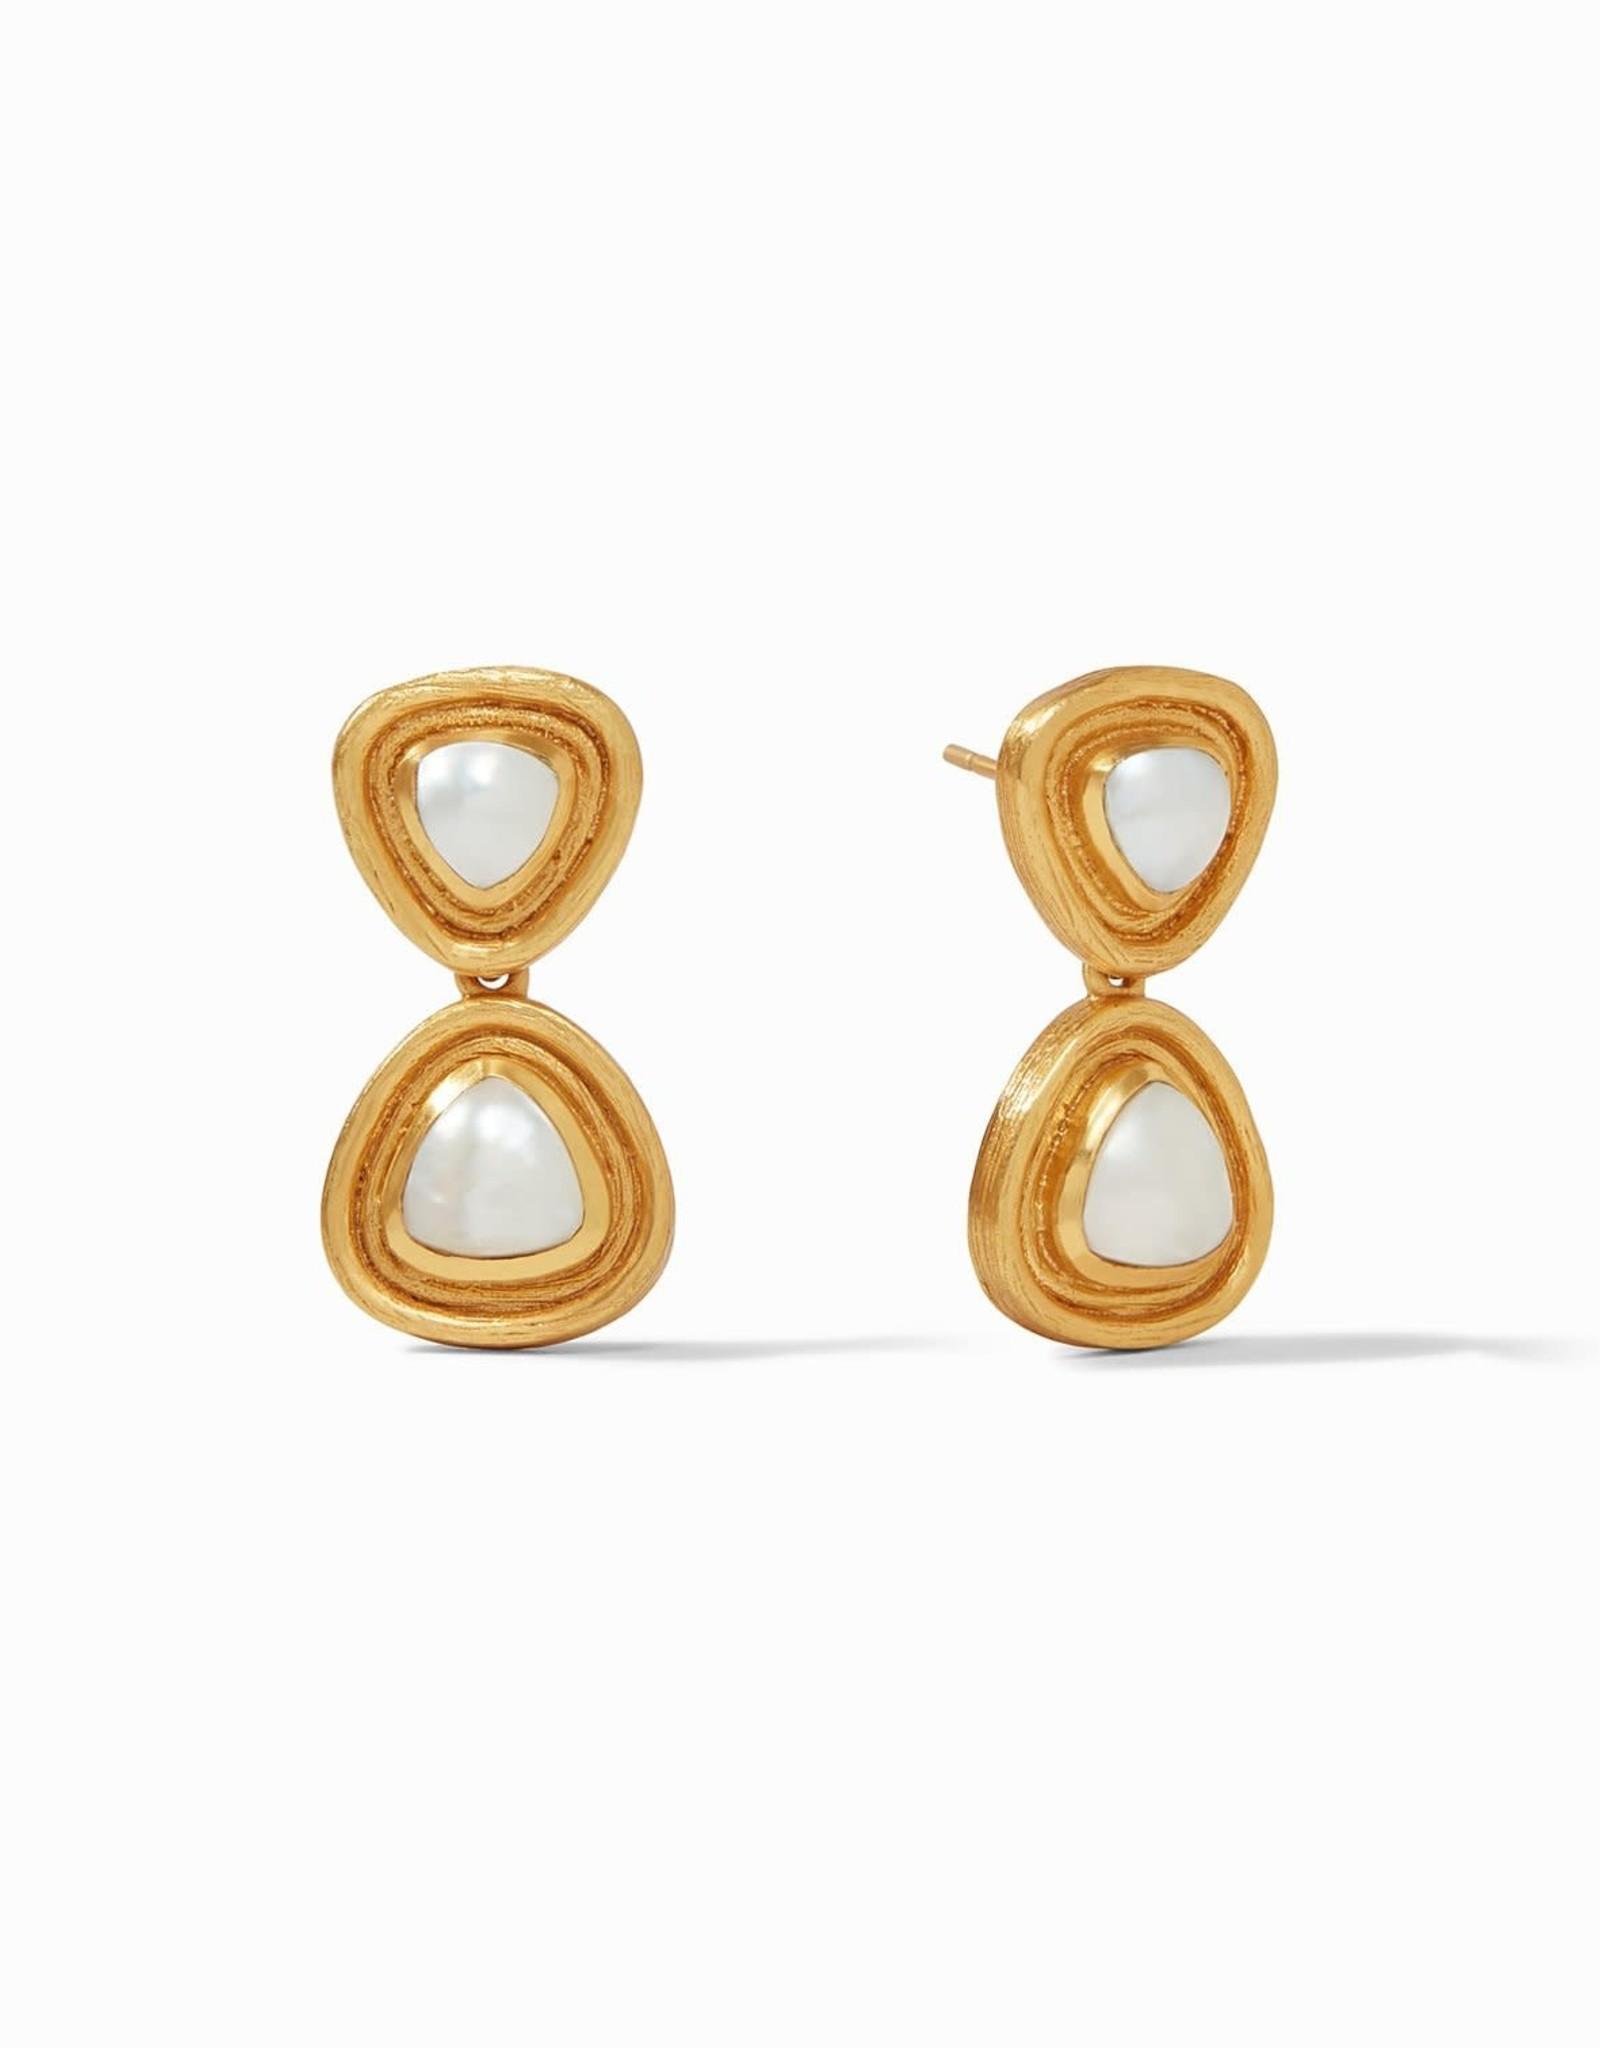 Julie Vos Barcelona Midi Earring Gold Pearl